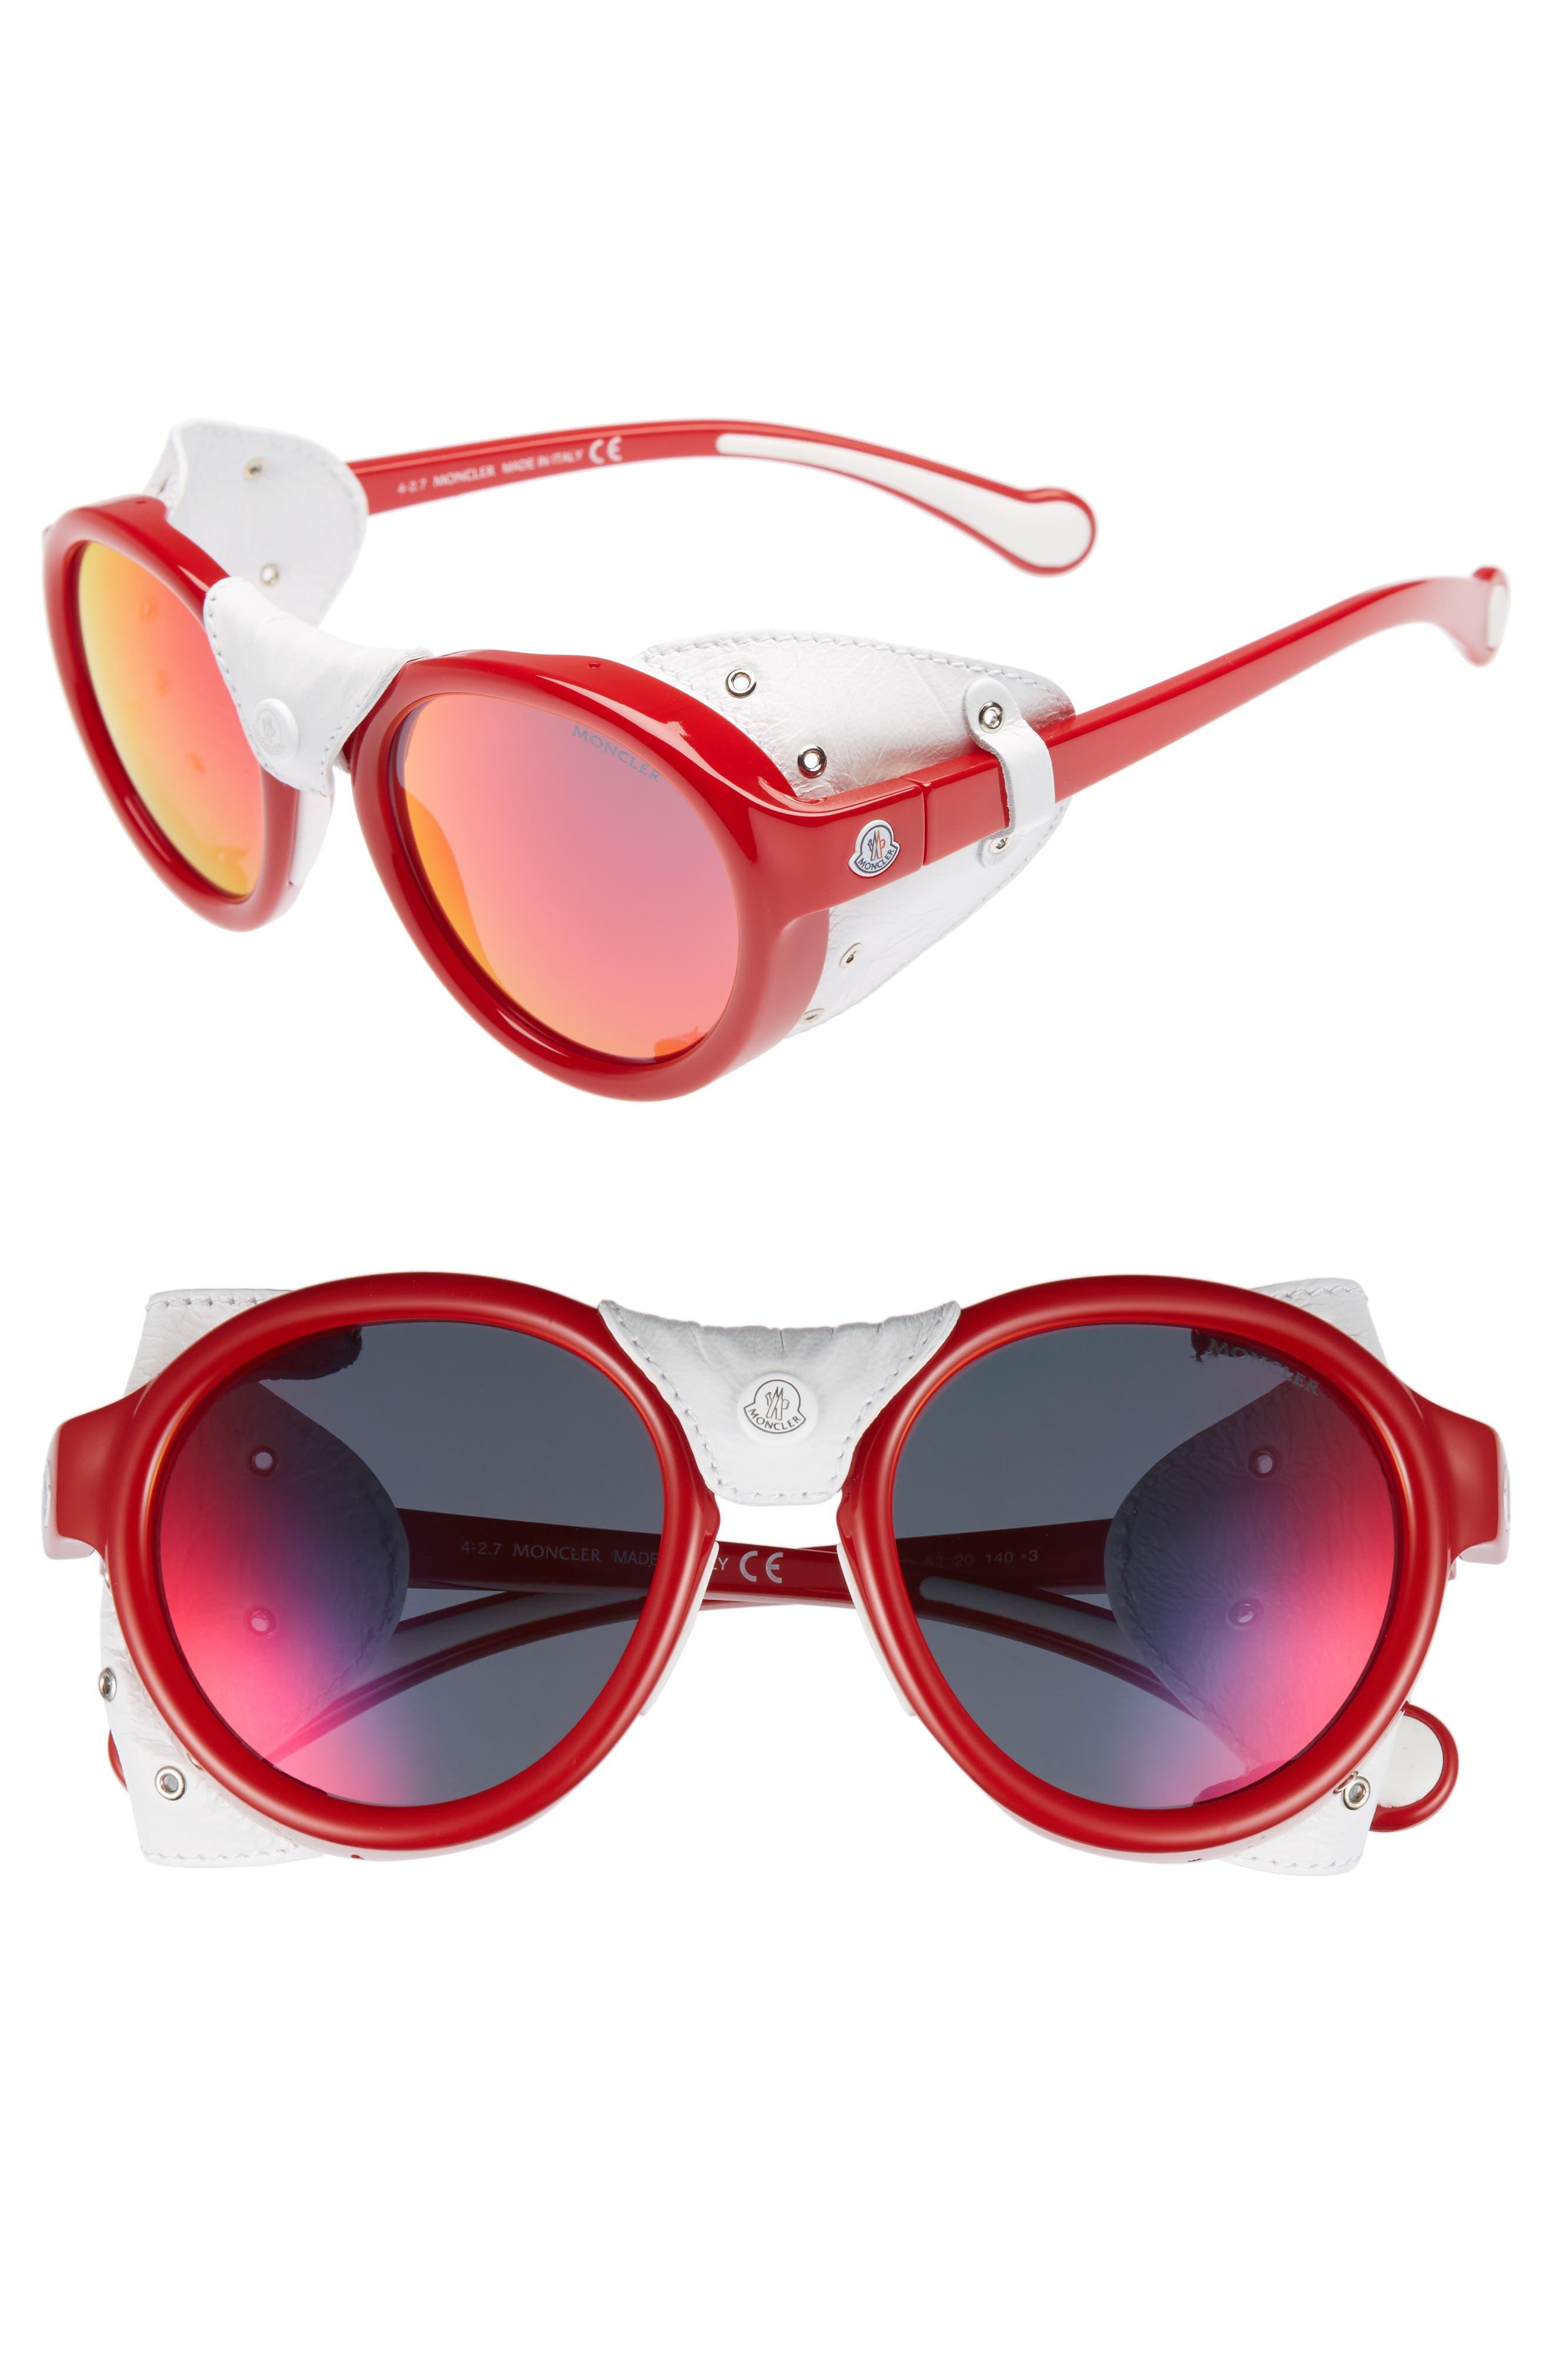 52mm Round Frame Retro Sunglasses,                             Main thumbnail 1, color,                             SHINY RED